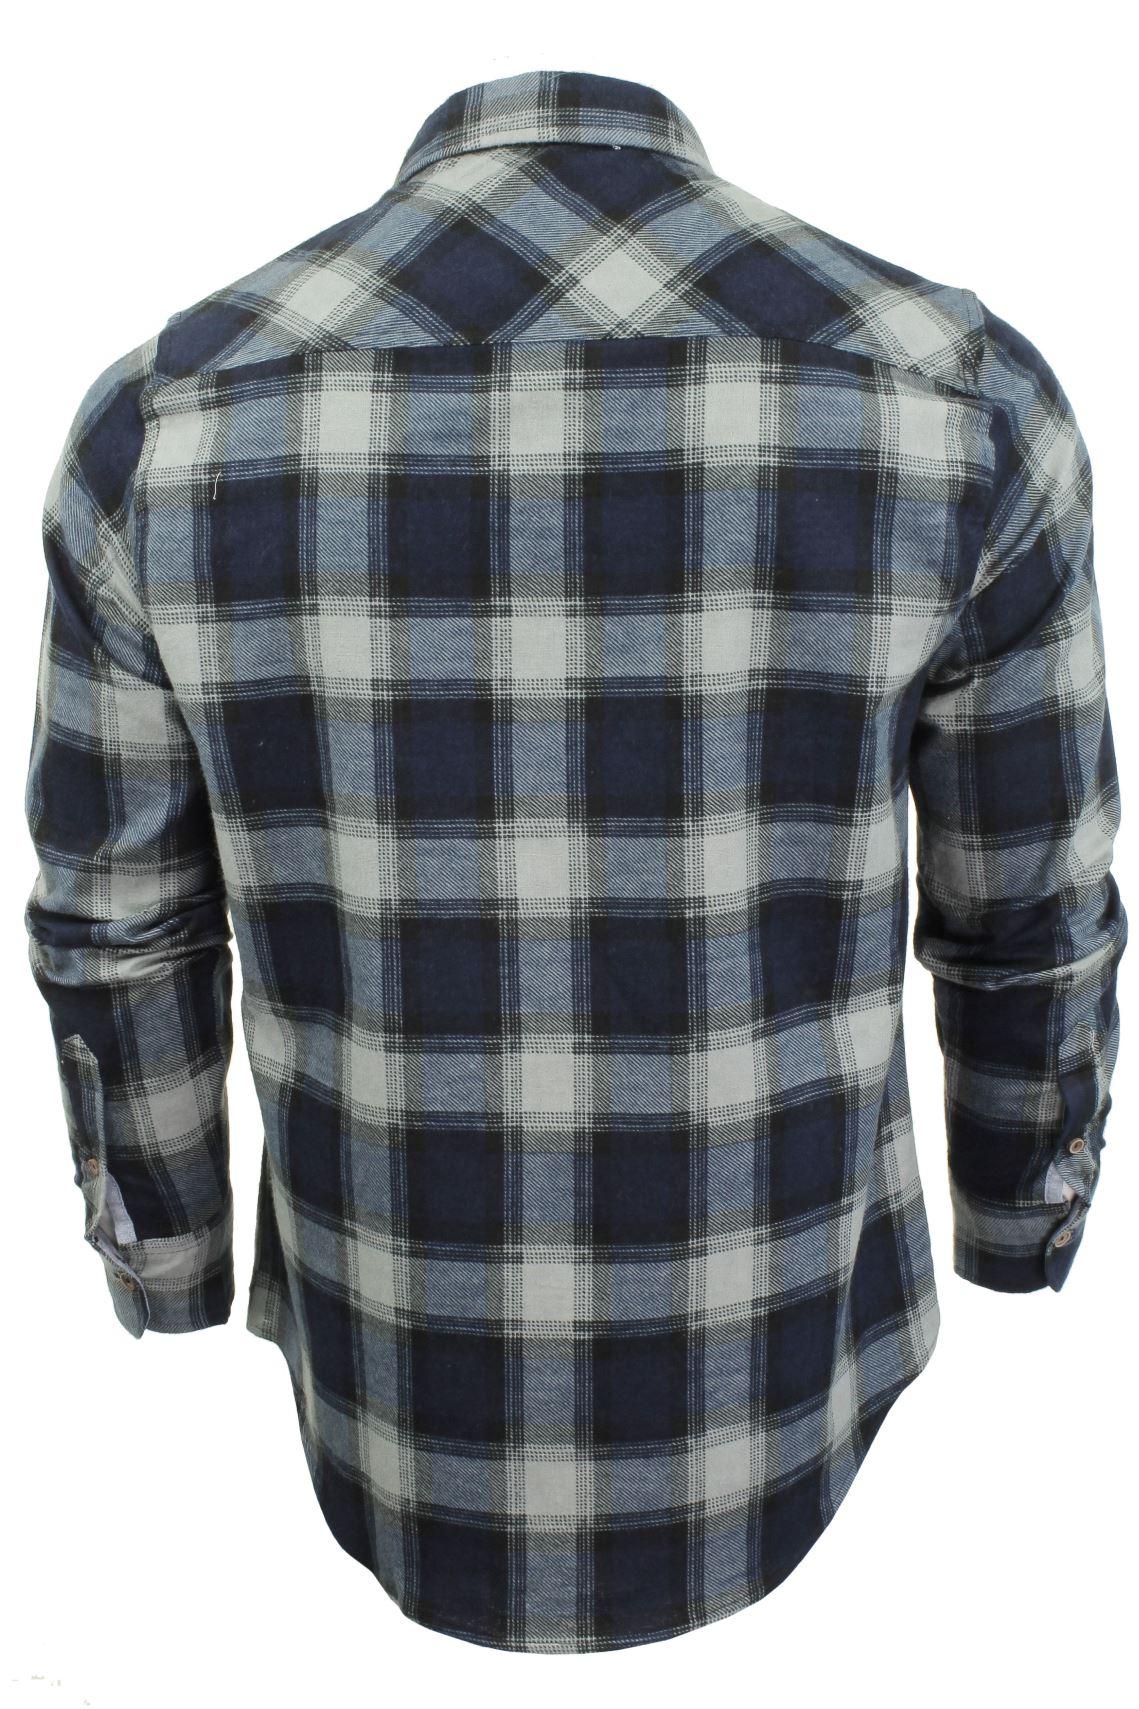 Brave-Soul-Brushed-Flannel-Check-Cotton-Jack-Shirt-Long-Sleeved thumbnail 15